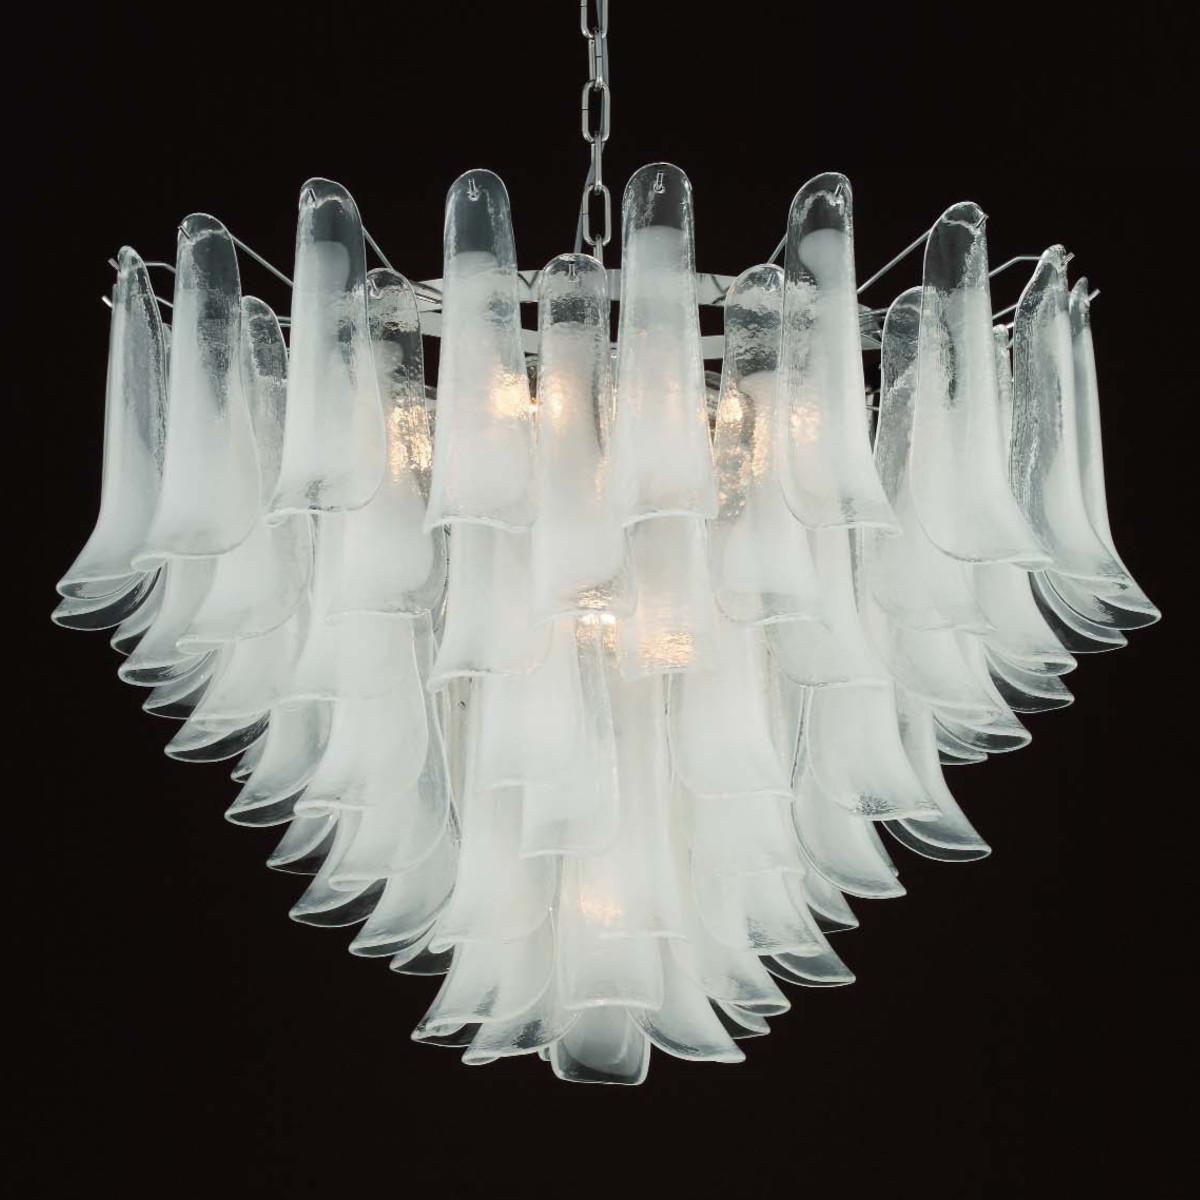 """Calypso"" lustre en cristal de Murano - 13 lumieres - blanc"